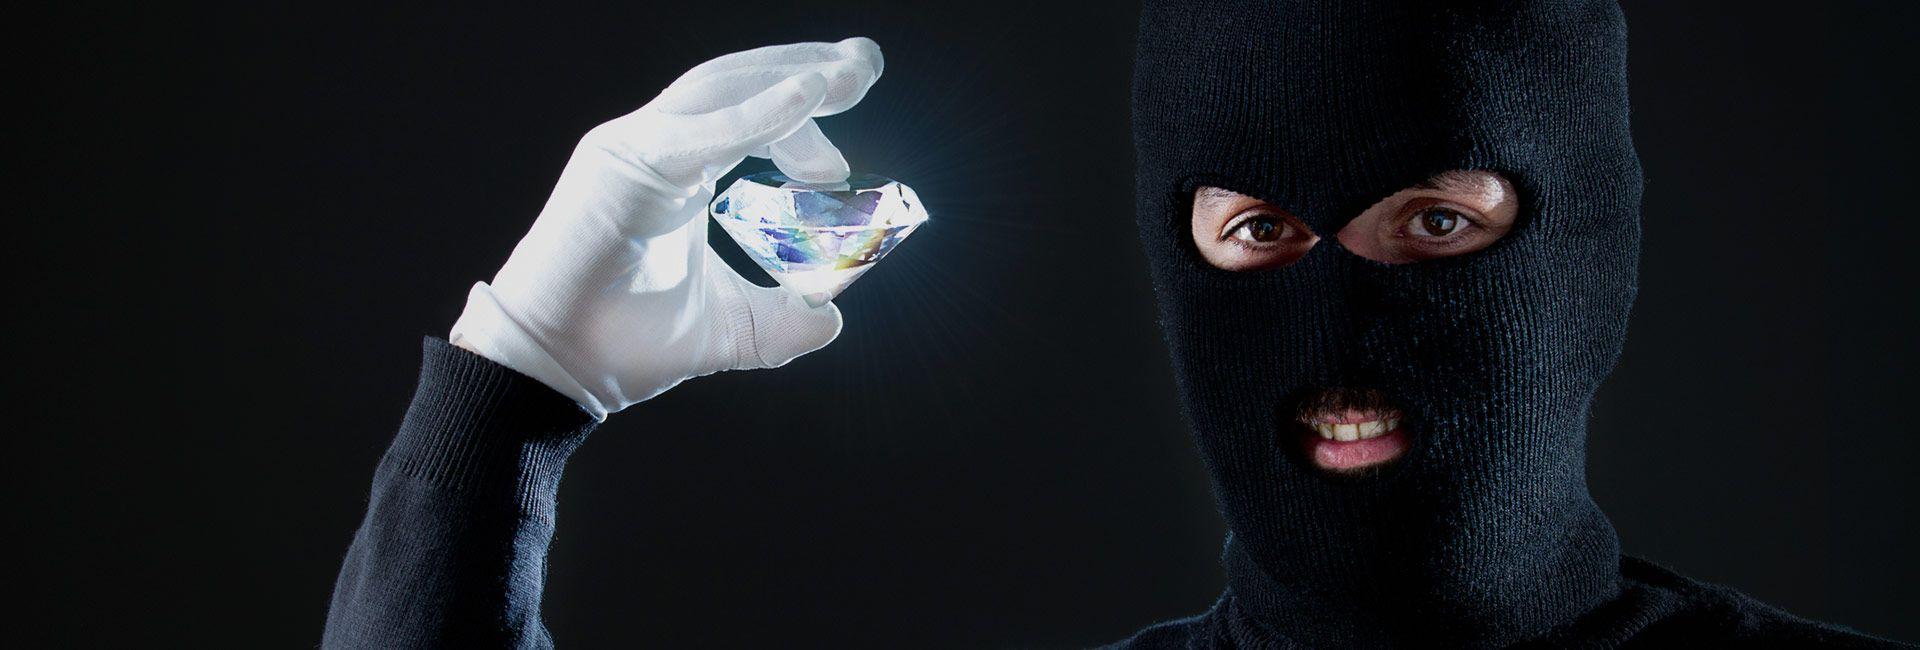 diamond heist event